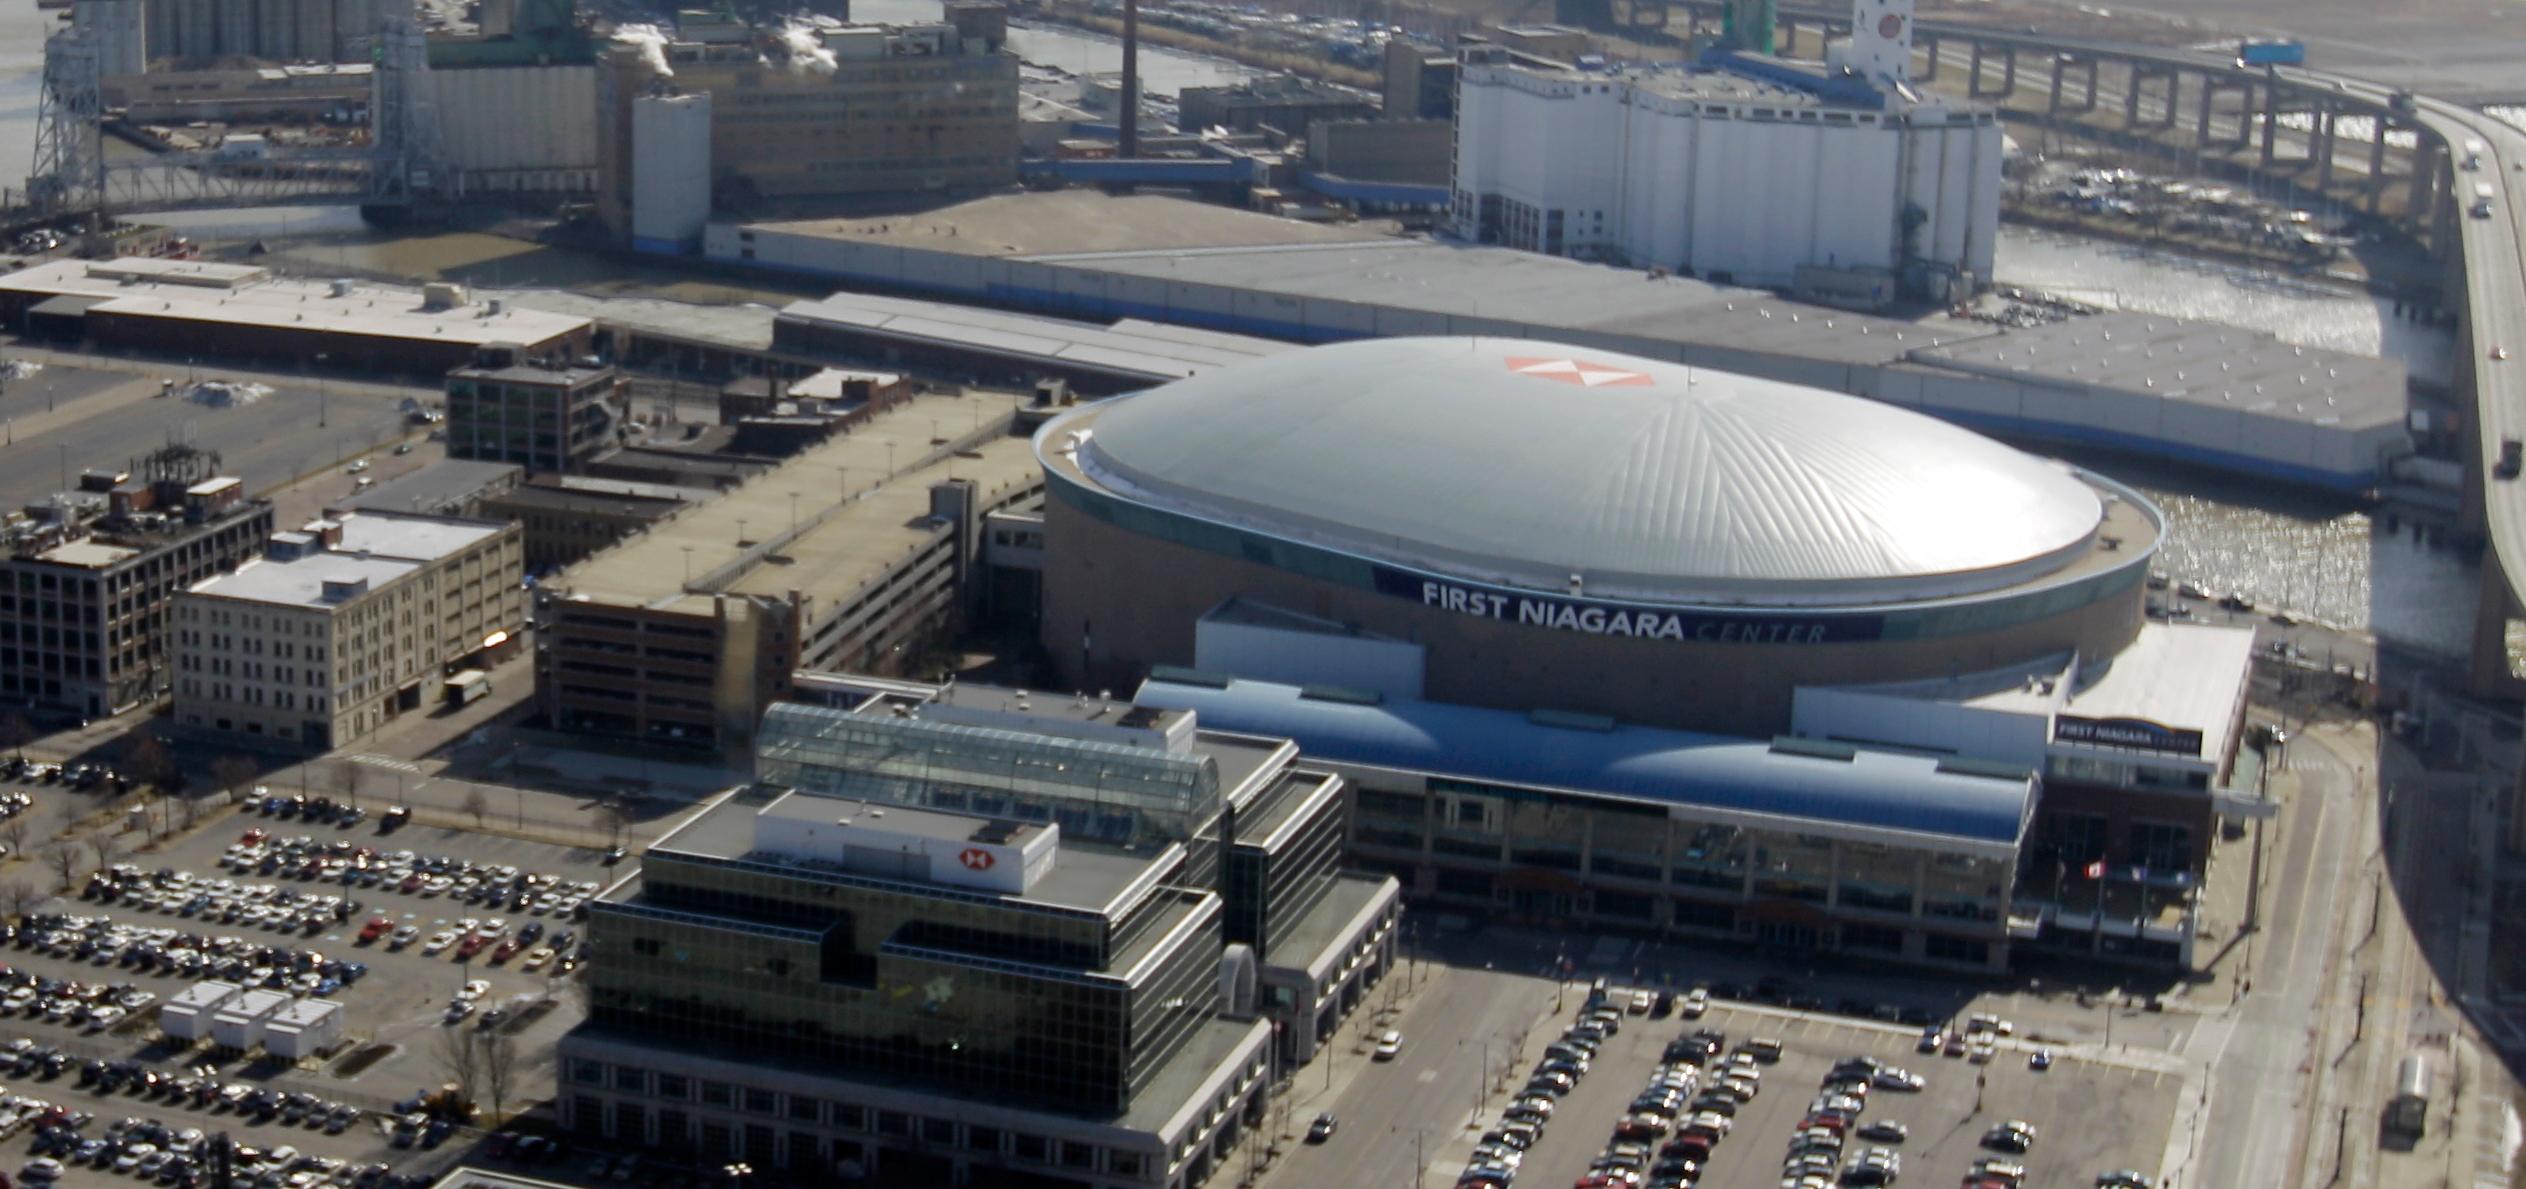 First Niagara Center_267885